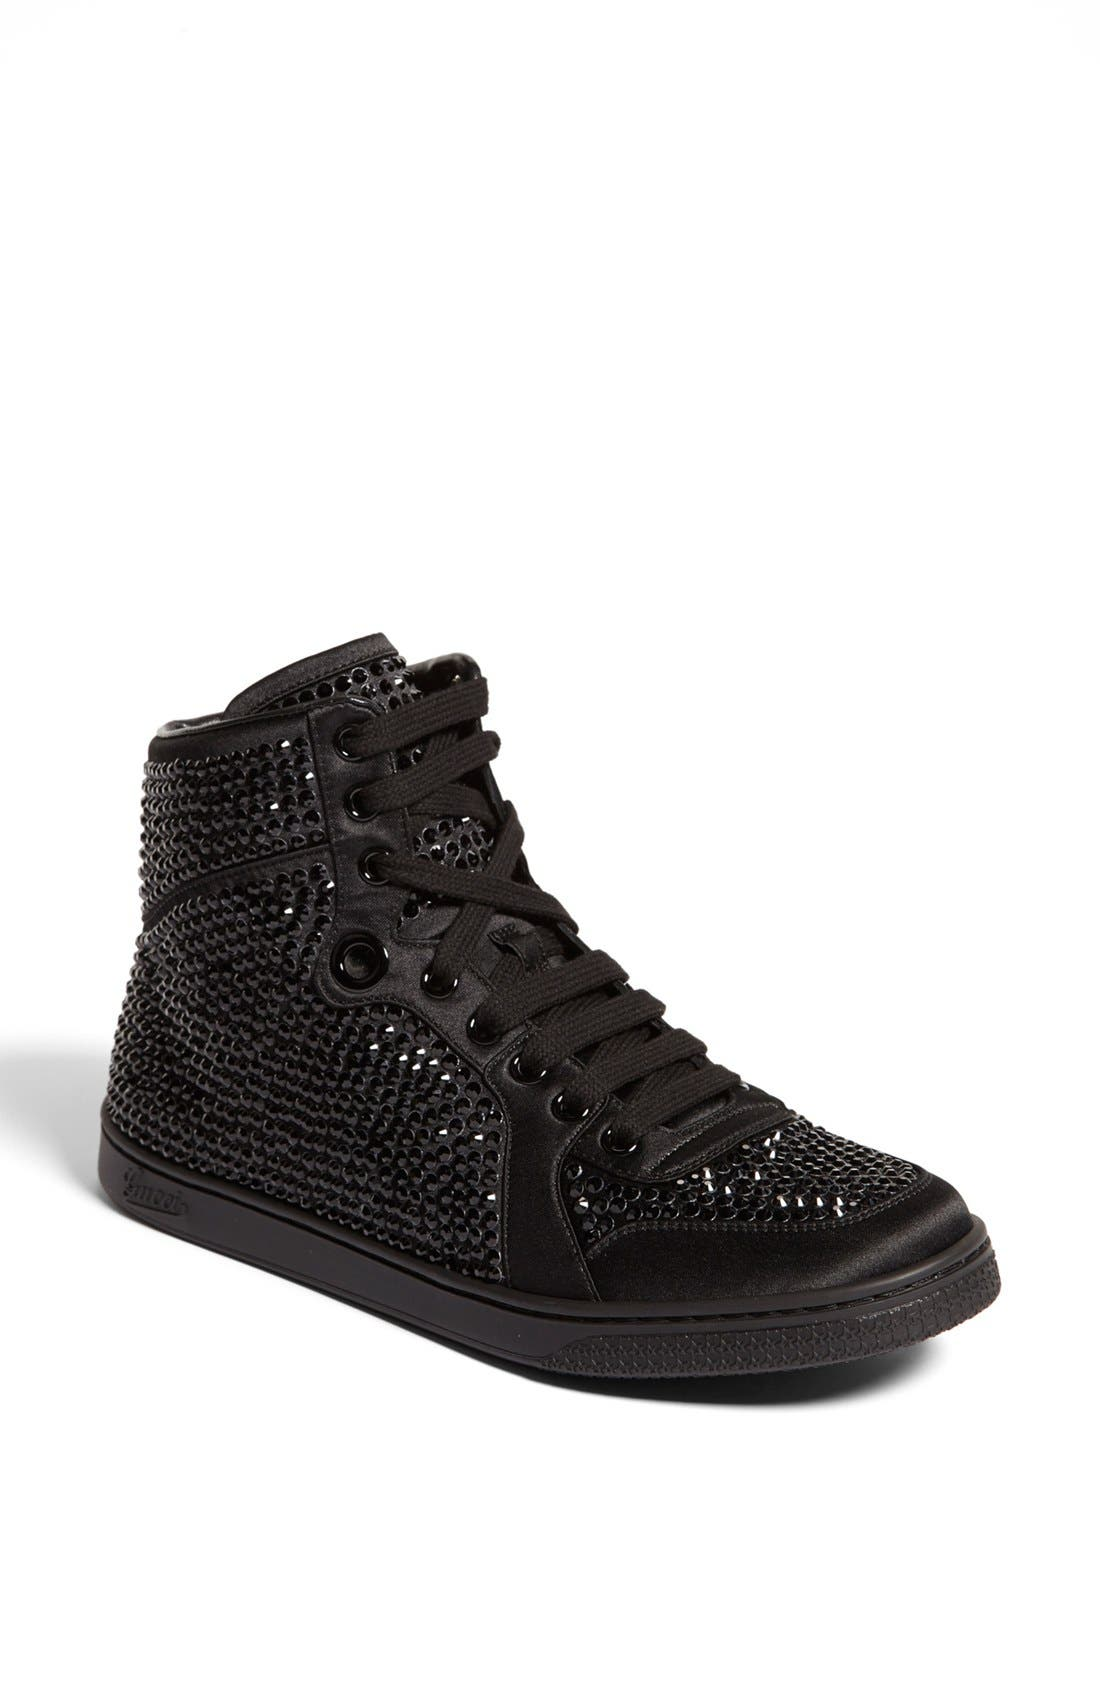 Alternate Image 1 Selected - Gucci 'Coda' Crystal Stud High Top Sneaker